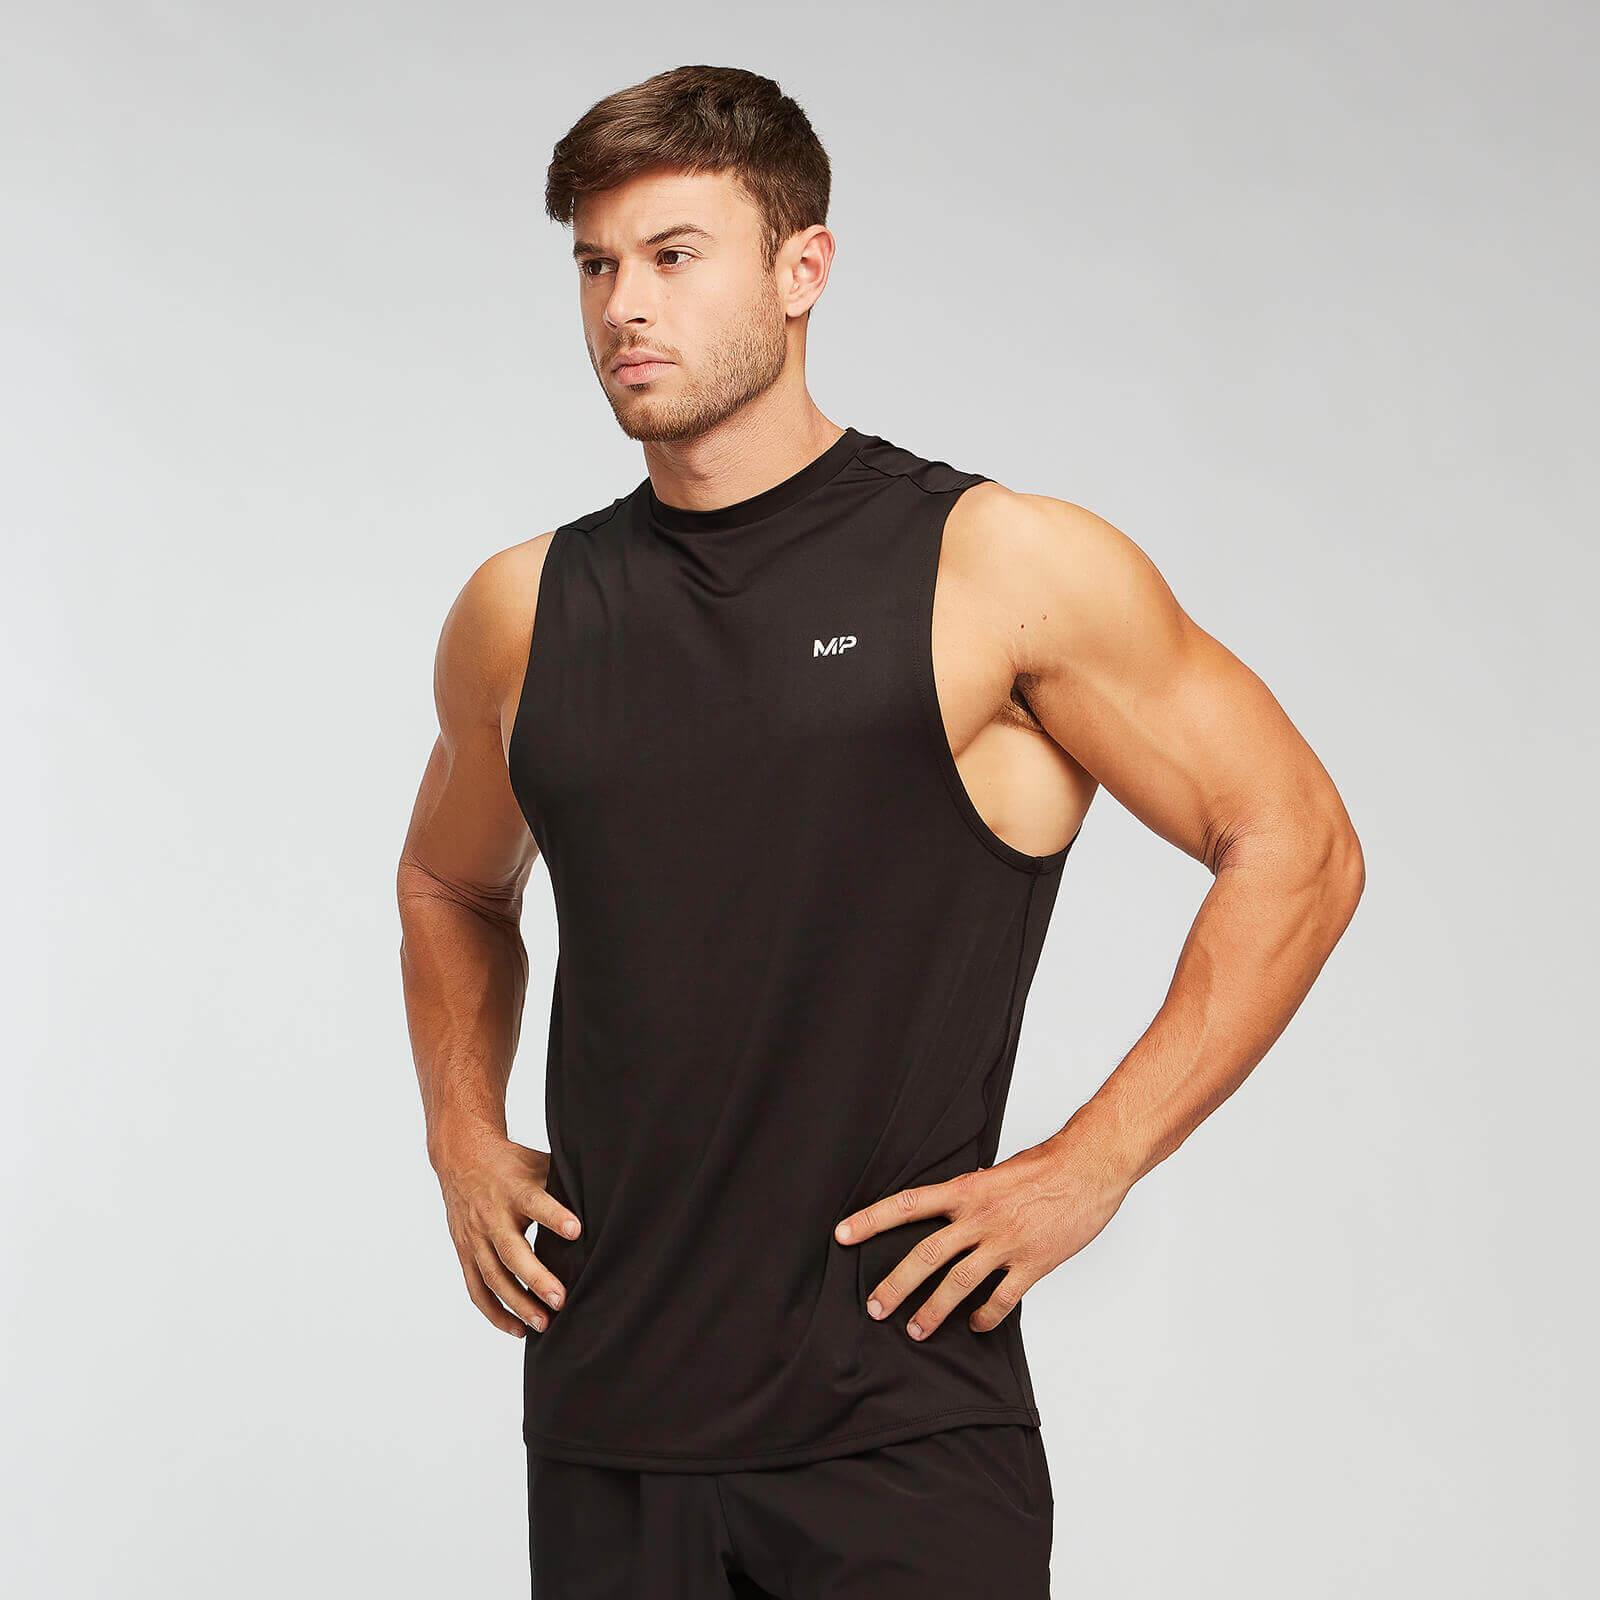 mp men's essentials tank top - black/white (2 pack) - s